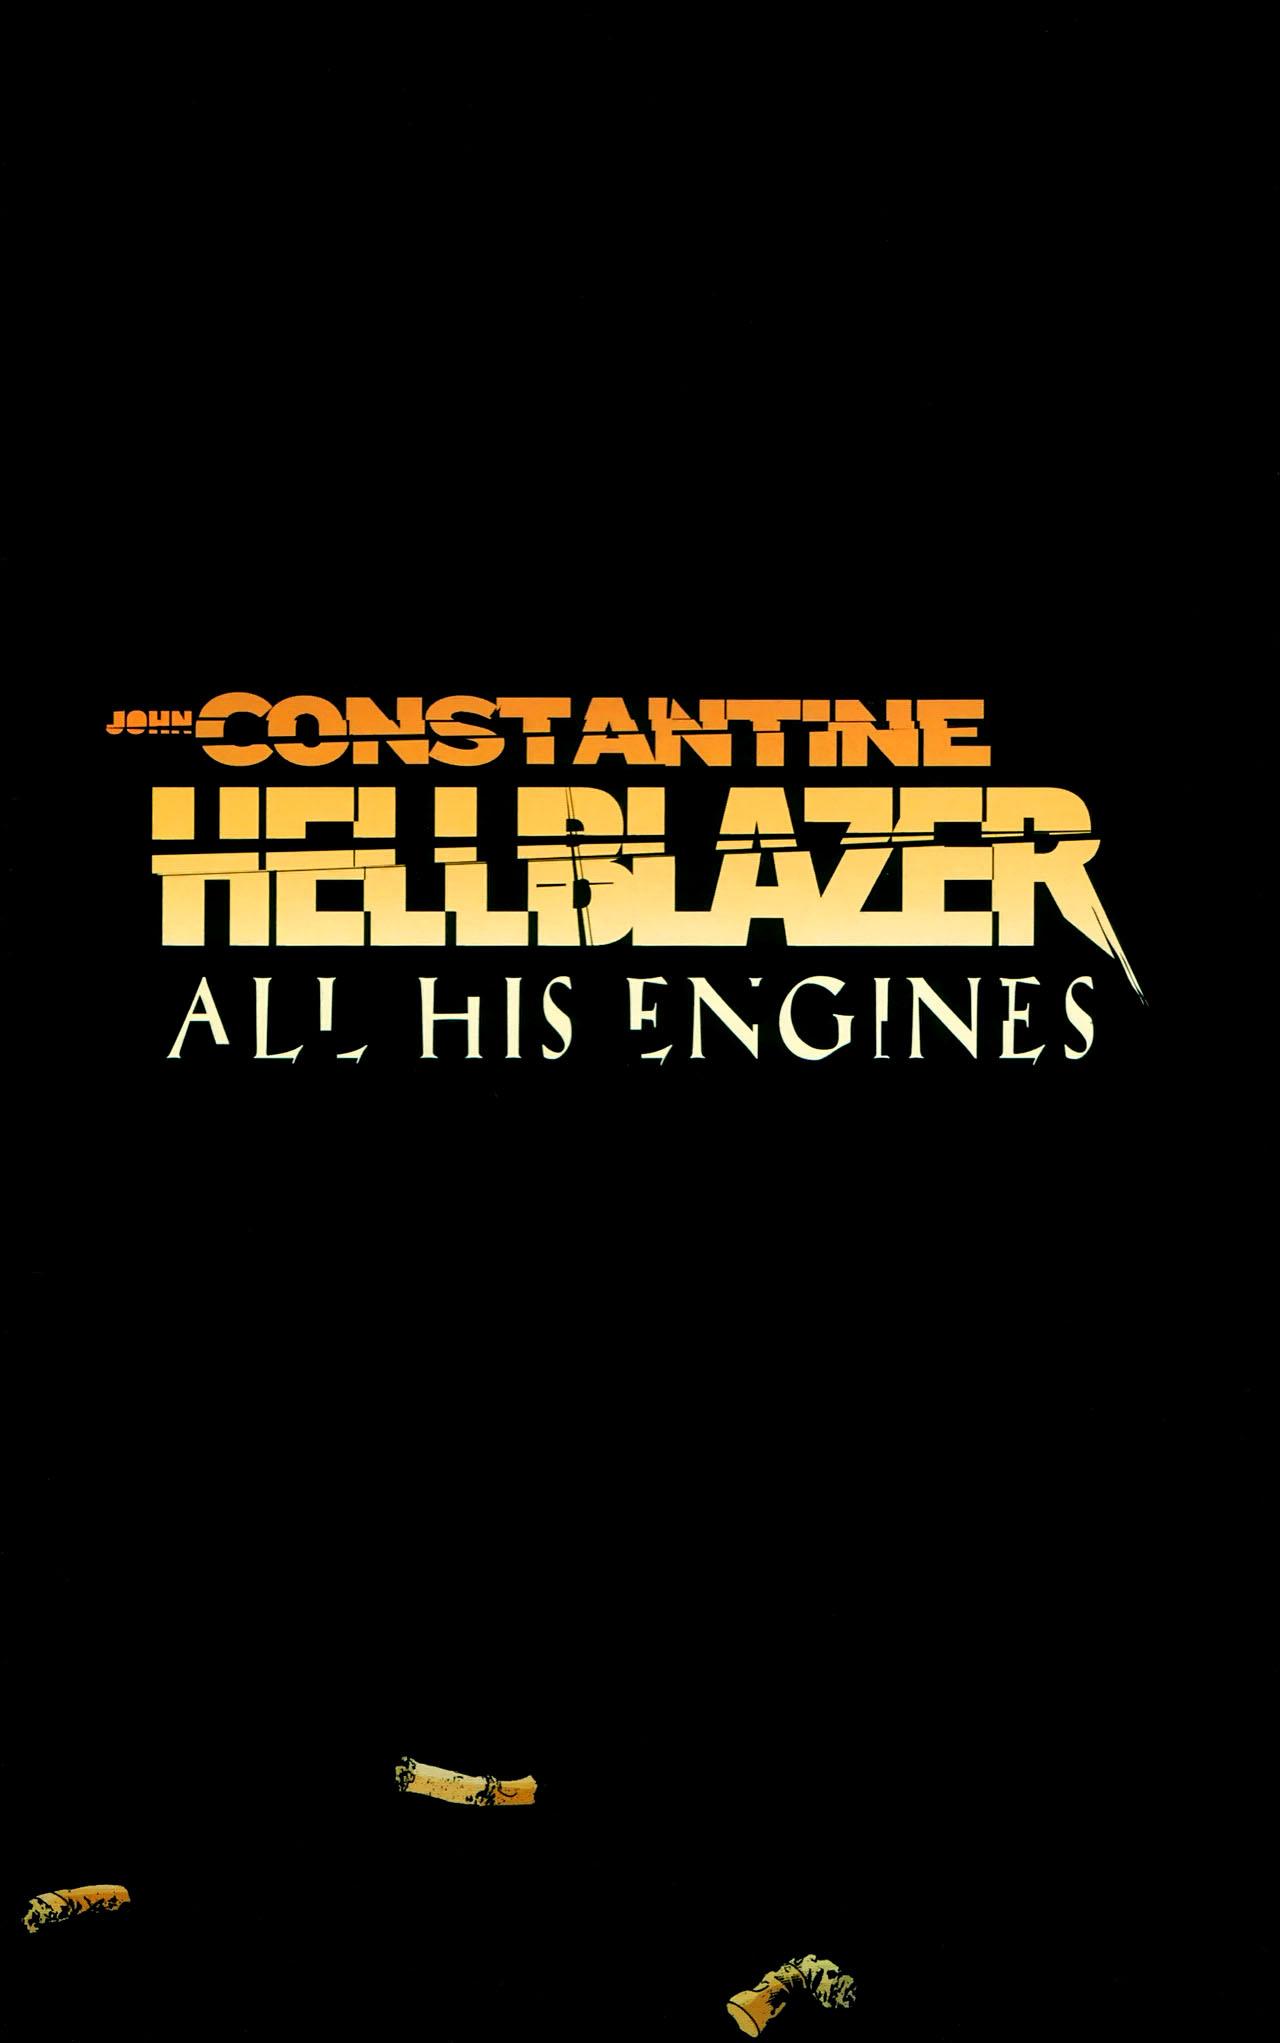 Read online John Constantine Hellblazer: All His Engines comic -  Issue # Full - 3